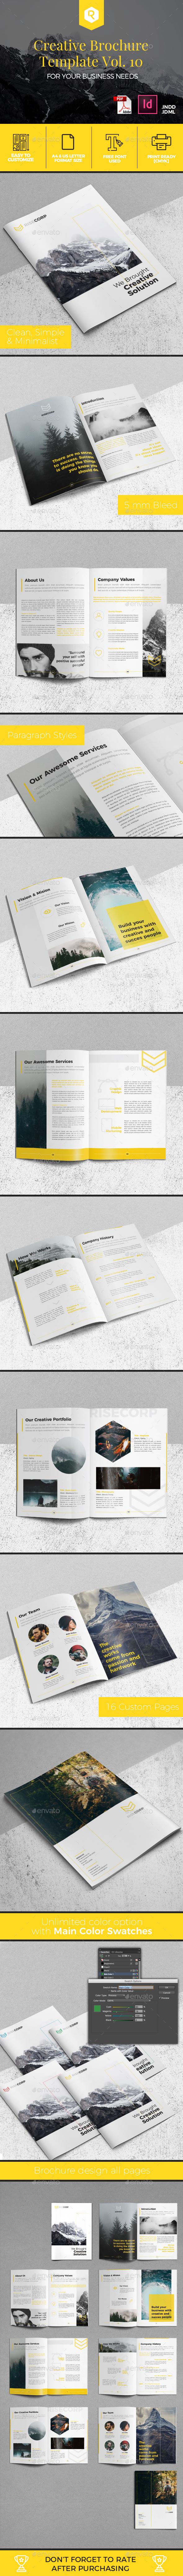 Creative Brochure Template Vol. 10